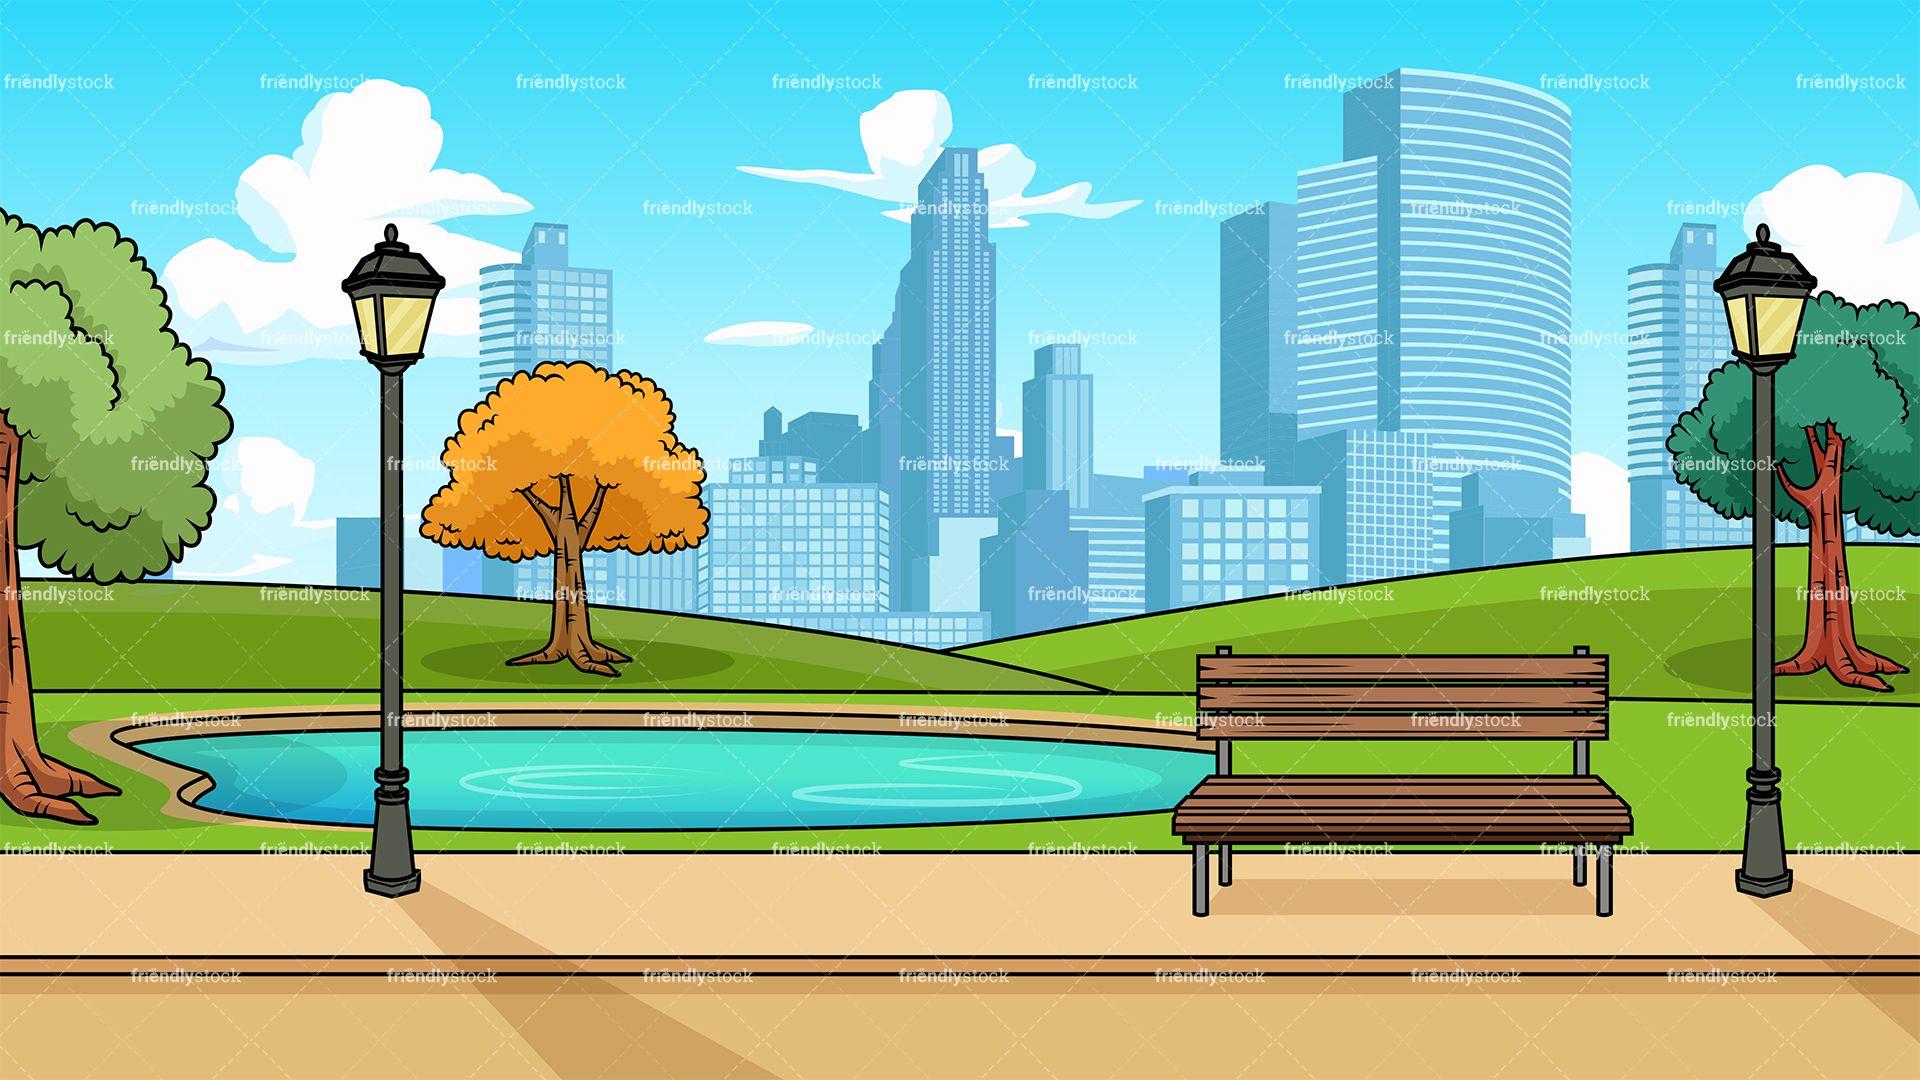 Clipart park city park. Modern background tanjung sepat